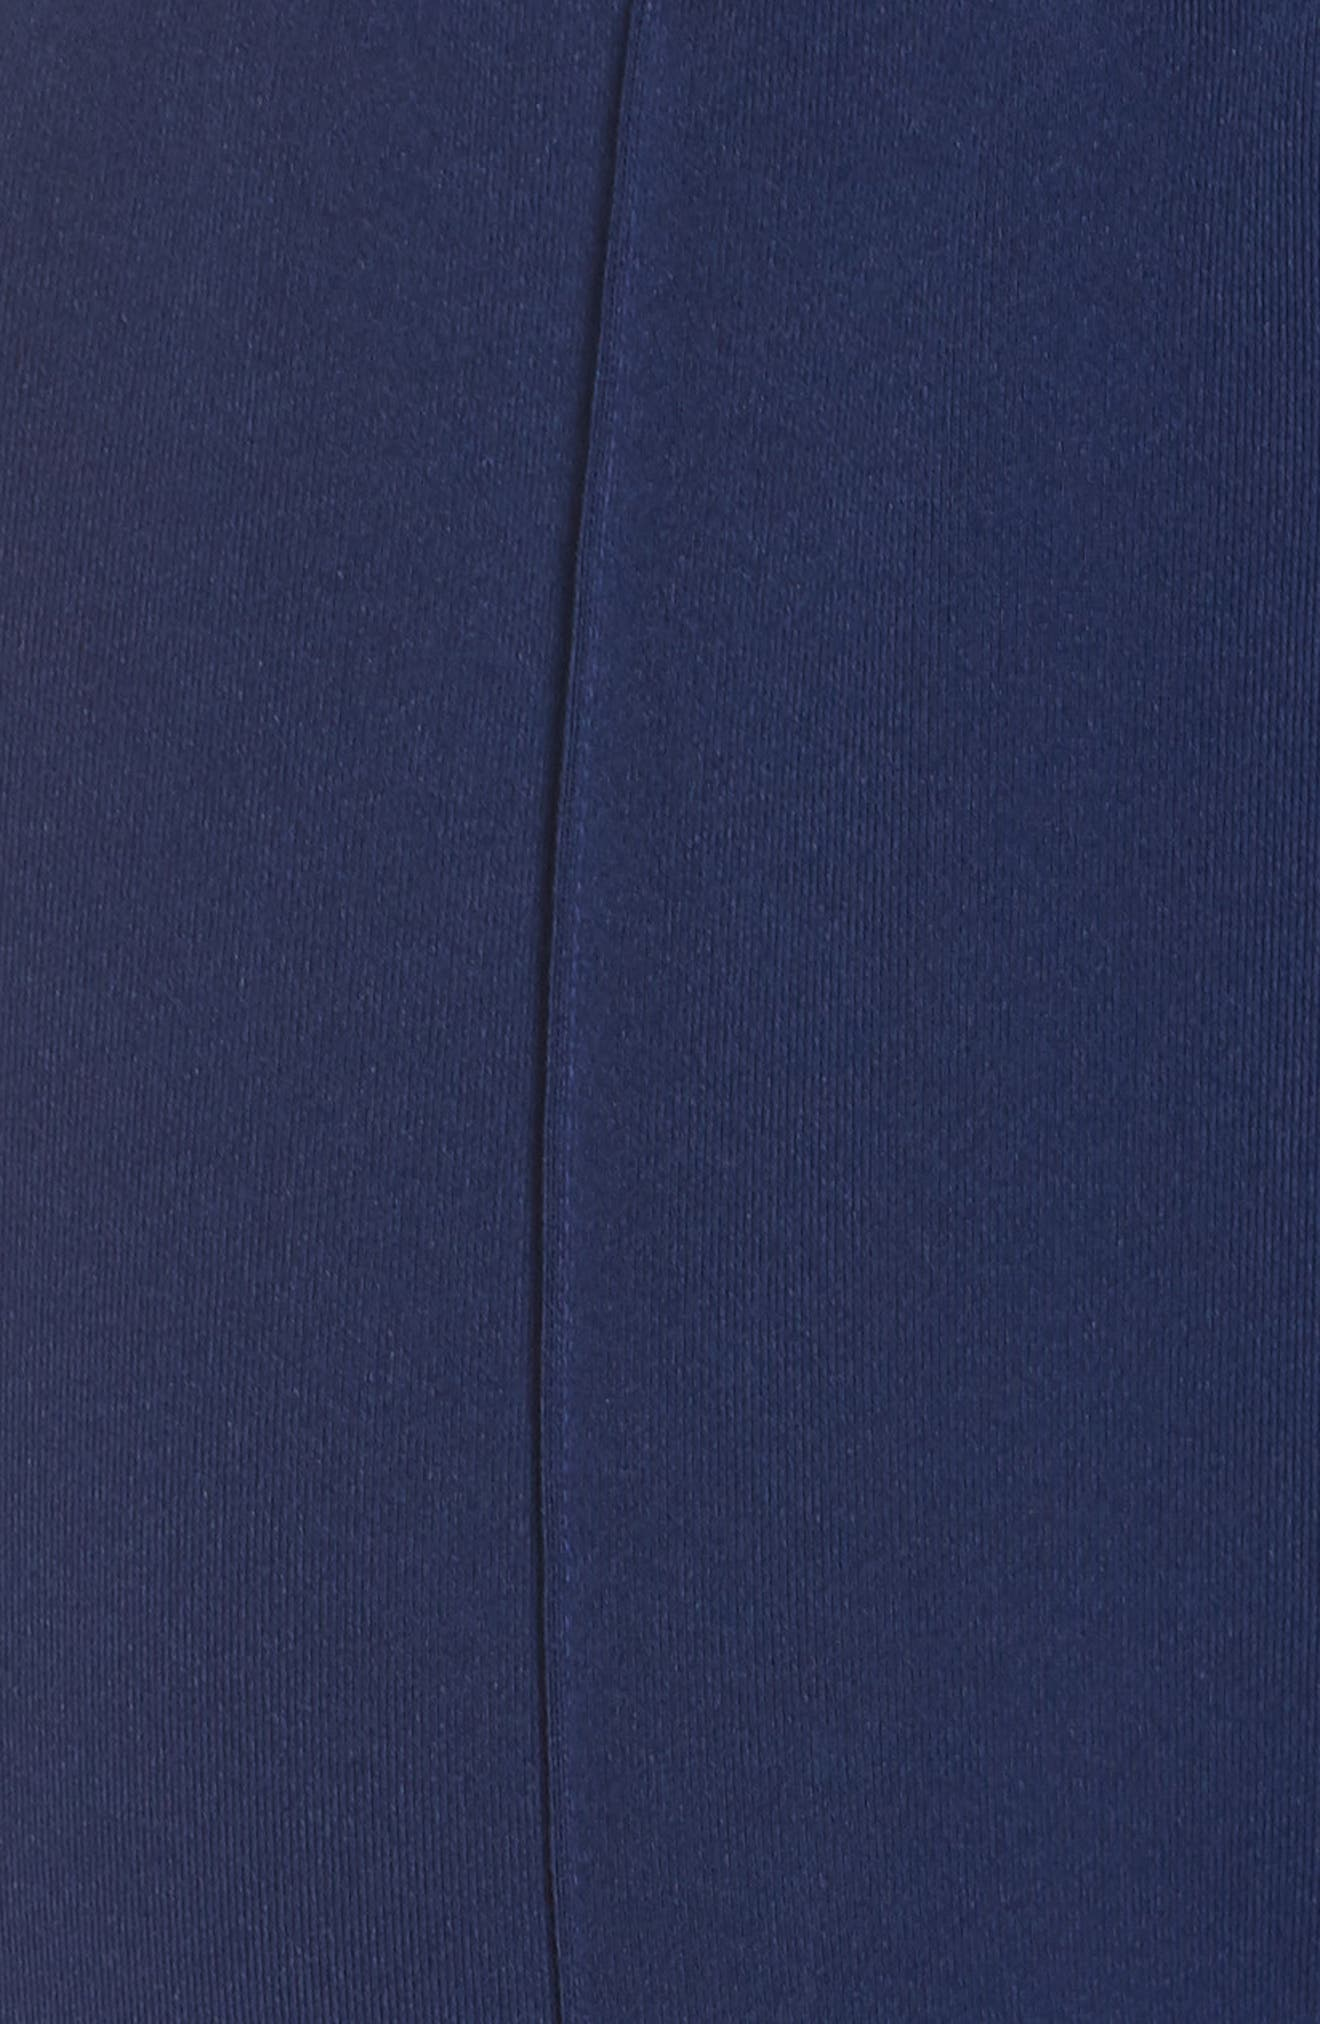 SST Track Pants,                             Alternate thumbnail 6, color,                             DARK BLUE